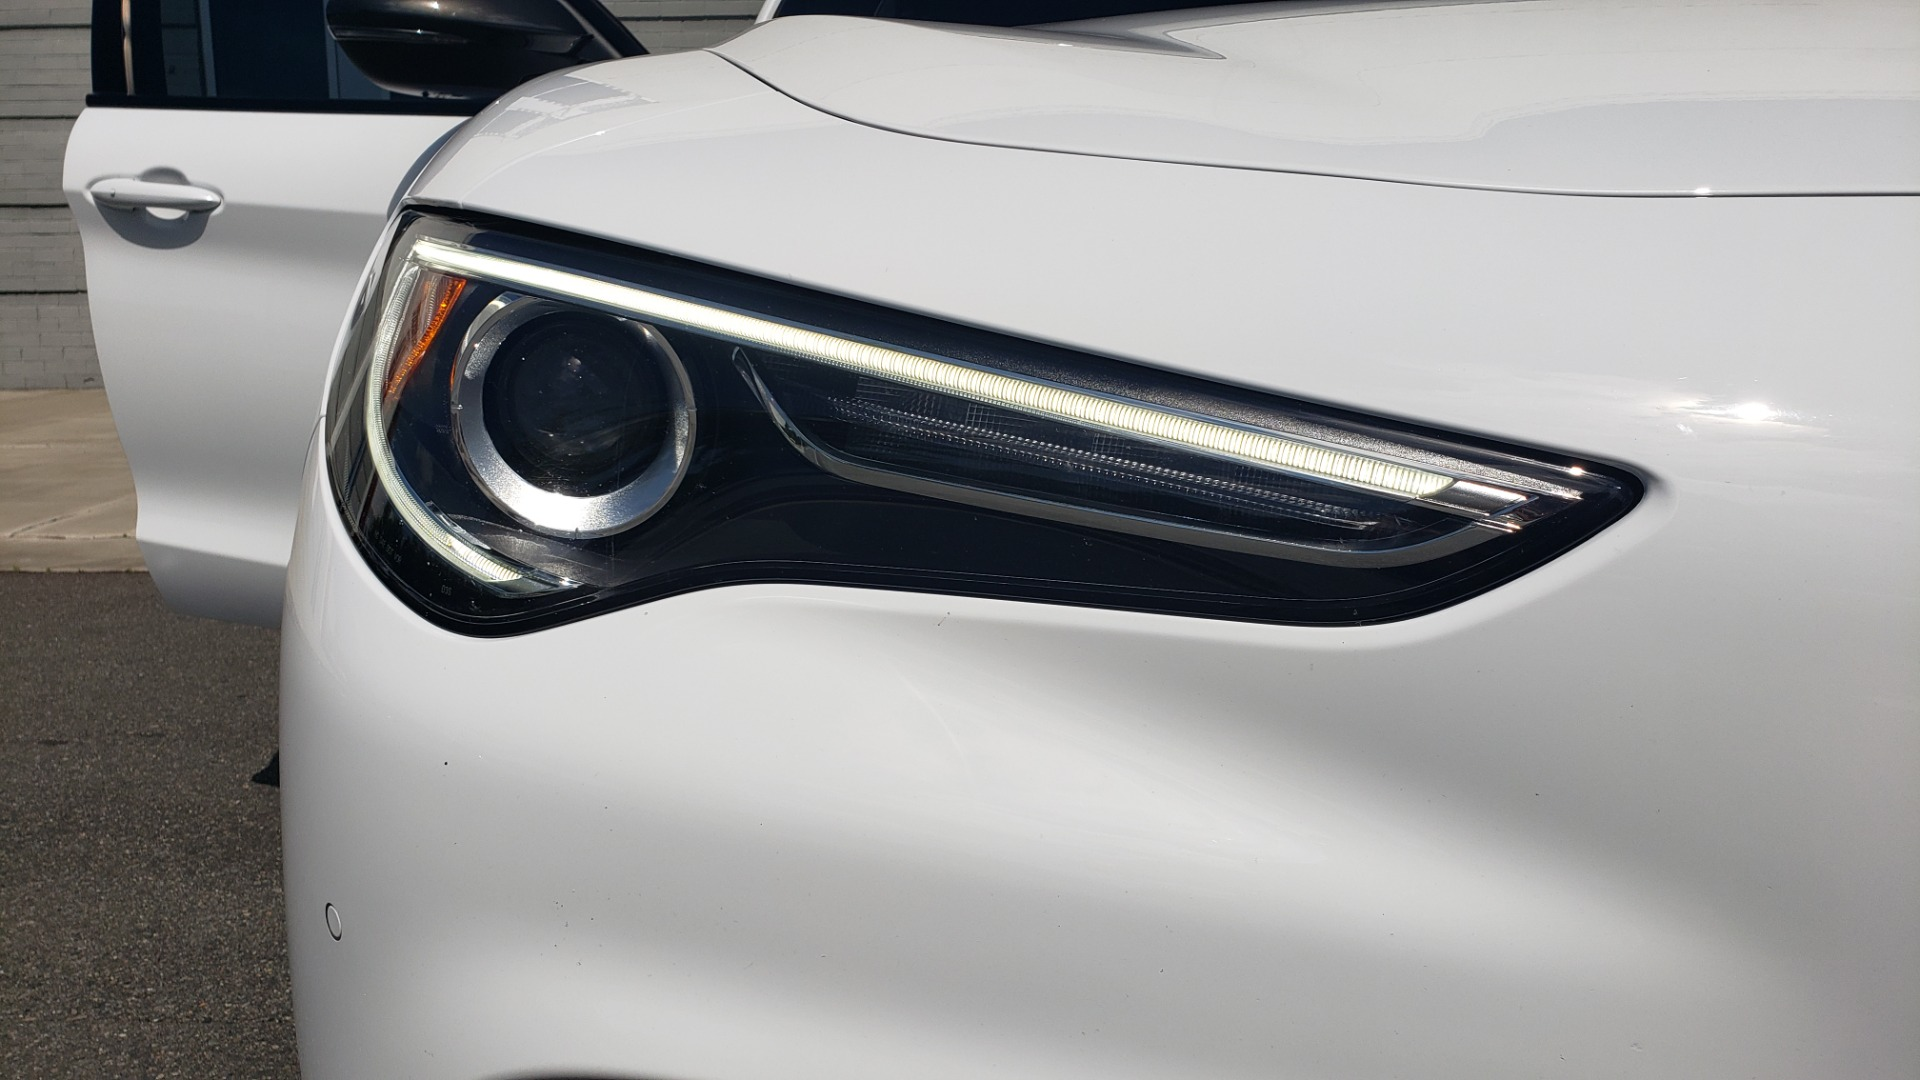 Used 2019 Alfa Romeo STELVIO TI SPORT AWD / 2.0L TURBO / 8-SPD AUTO / DRVR ASST / REARVIEW for sale $37,495 at Formula Imports in Charlotte NC 28227 26